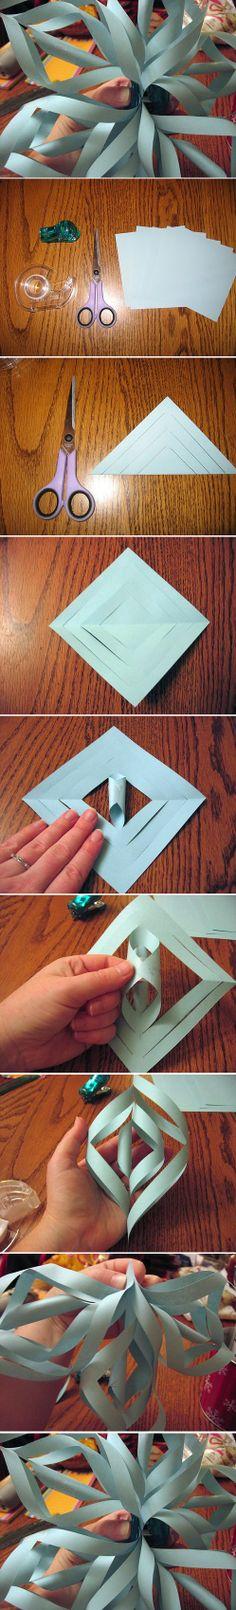 DIY Ideas: 3D Paper Snowflake